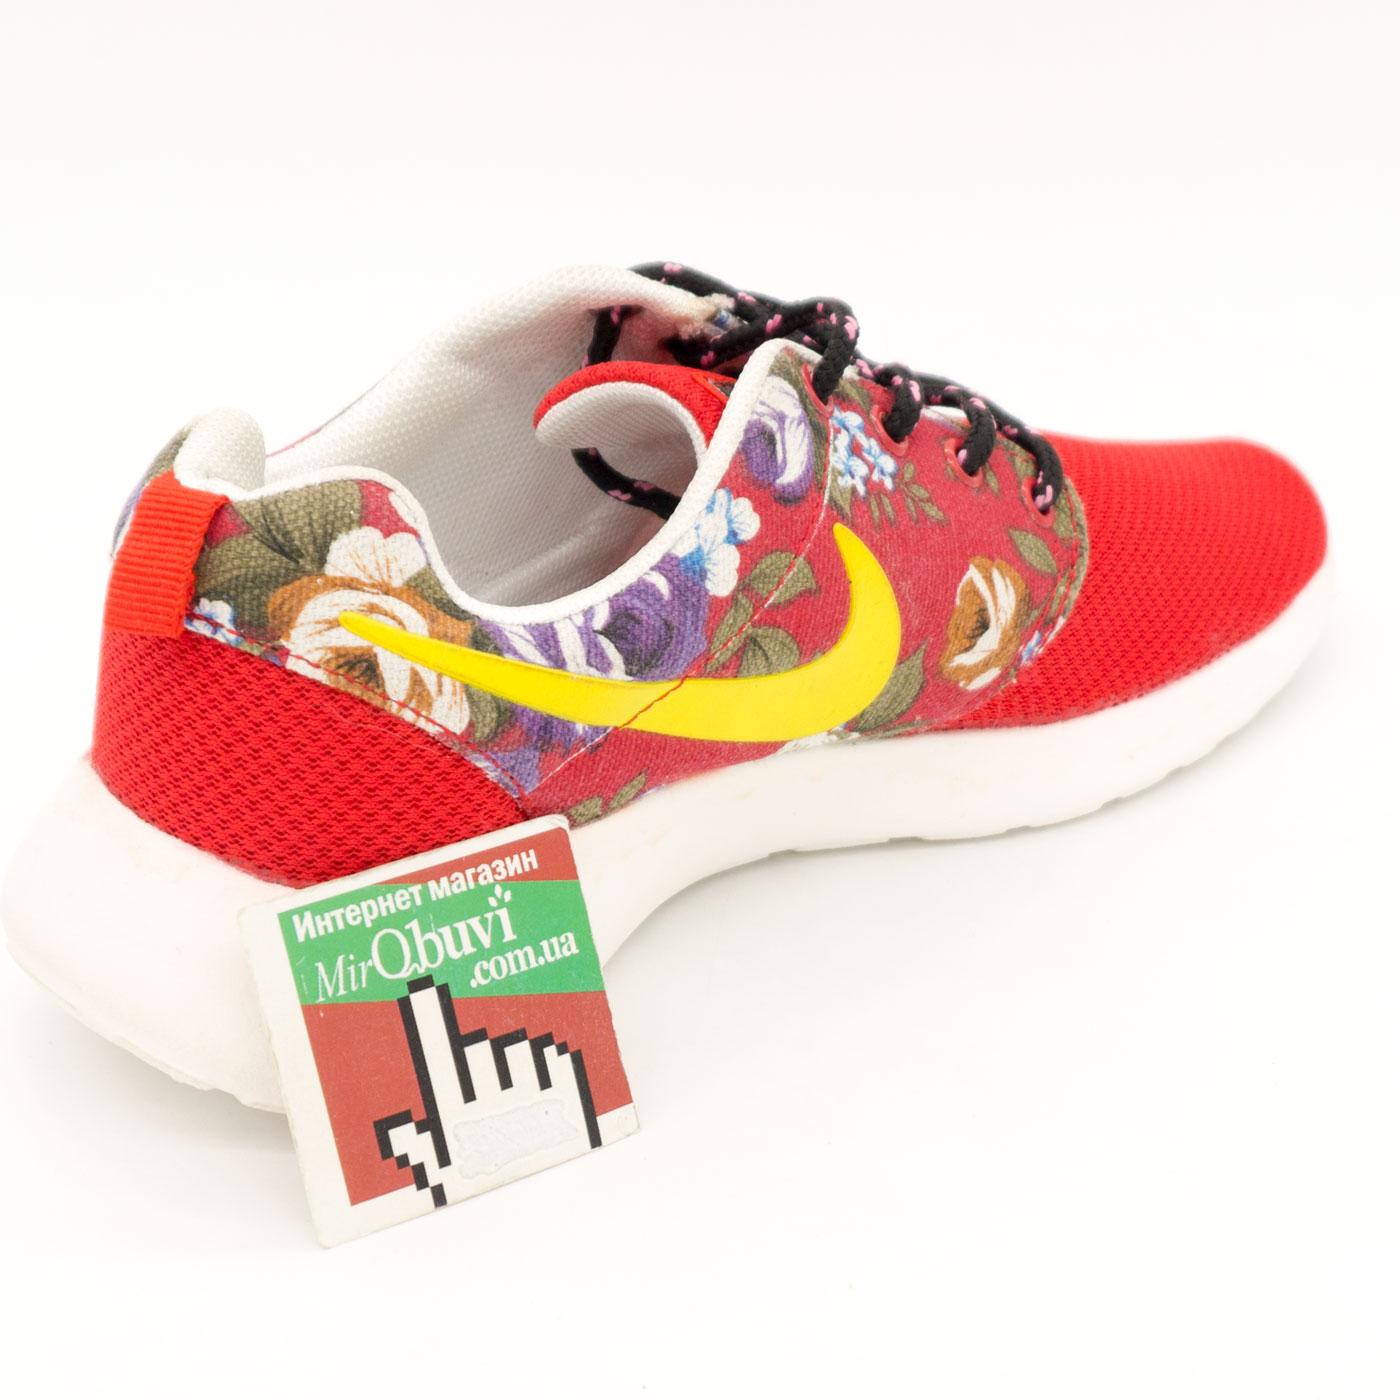 фото back Nike Roshe Run  полностью черные 511881 066 back